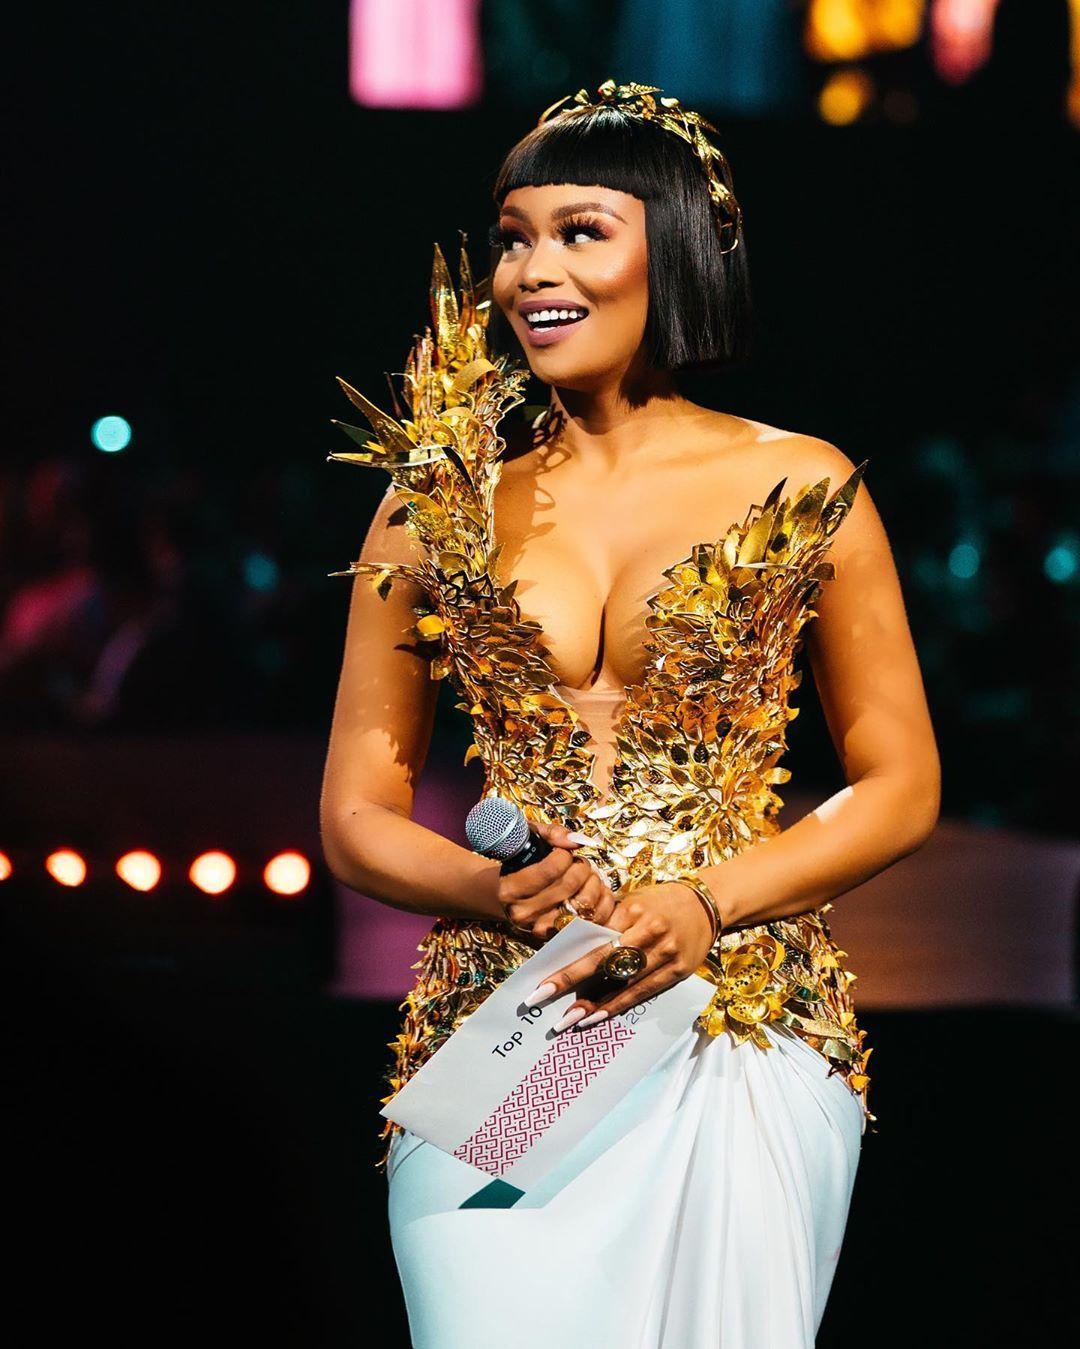 Every Look Bonang Matheba Wore as Miss South Africa 2019